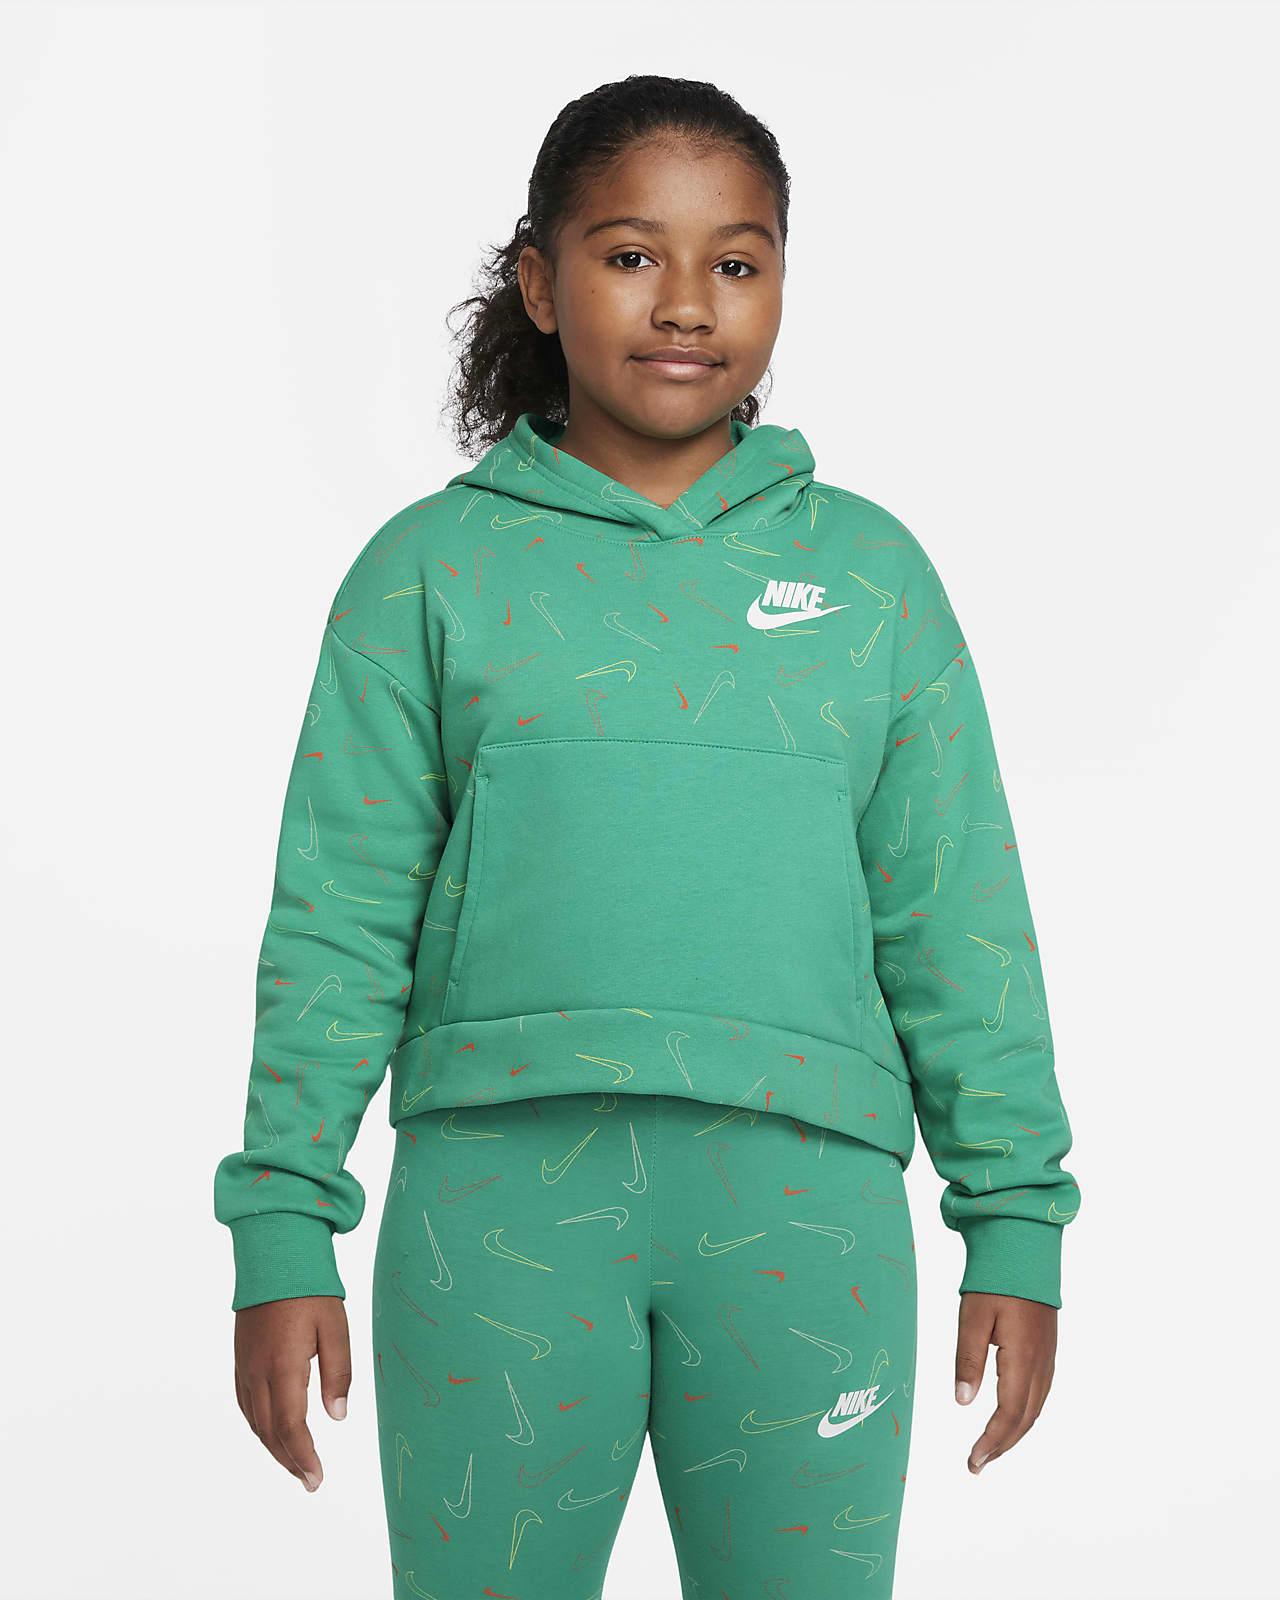 Nike Sportswear Big Kids' (Girls') Printed Fleece Hoodie (Extended Size)